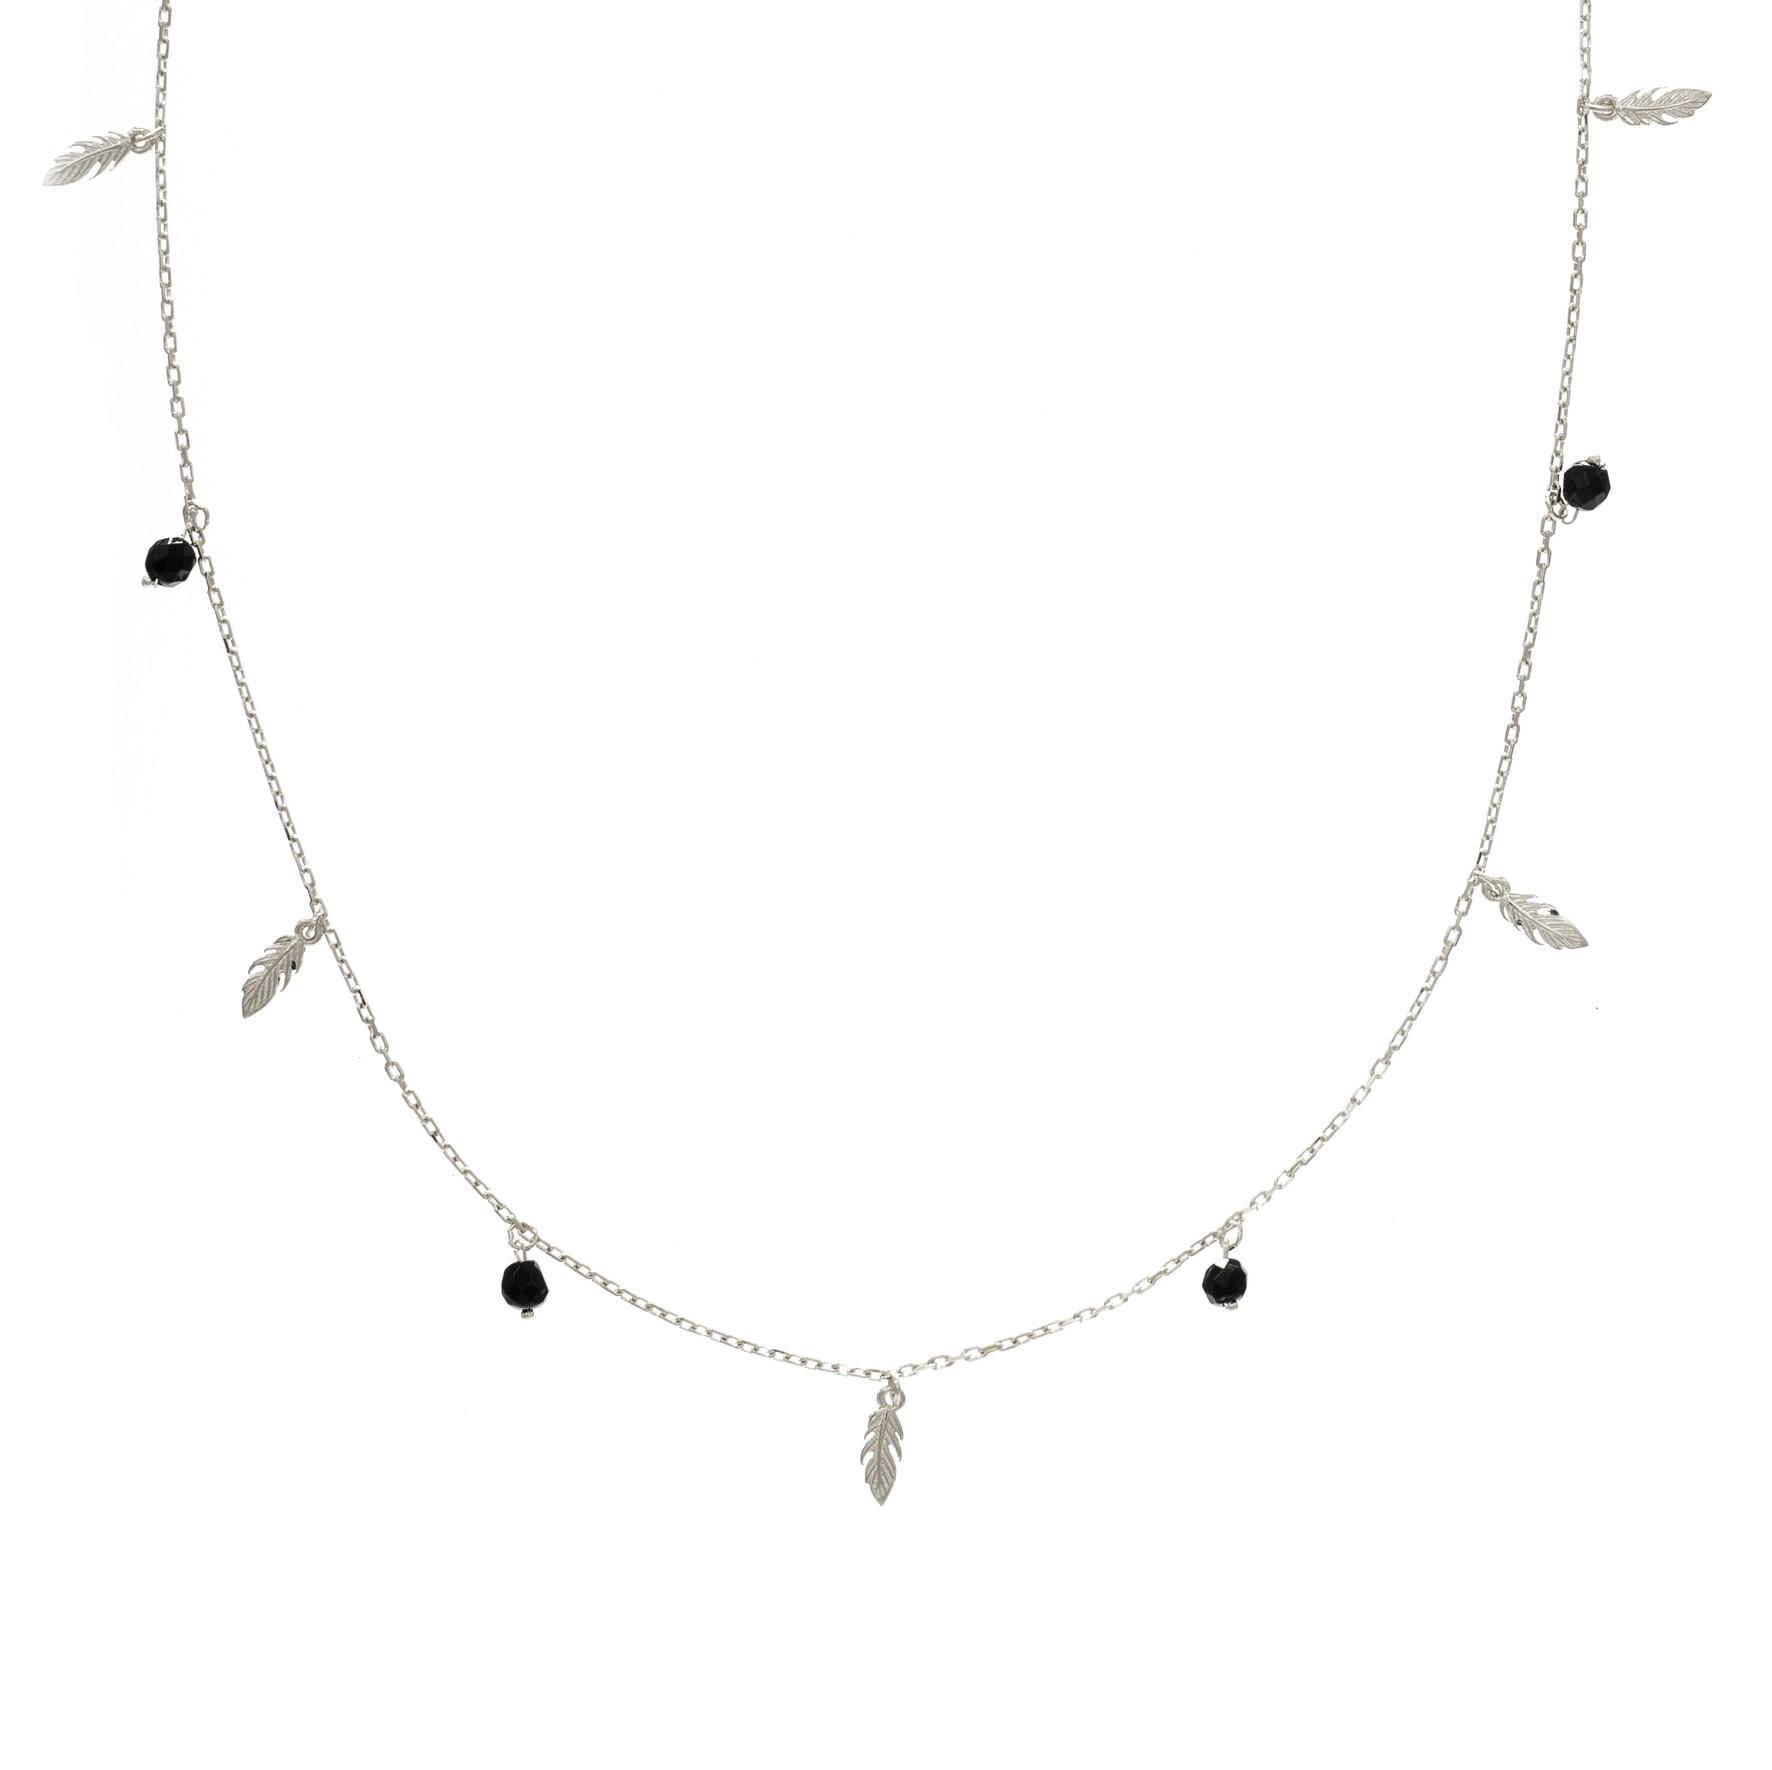 Naszyjnik OVAL srebrny z naturalnym onyksem i piórkami